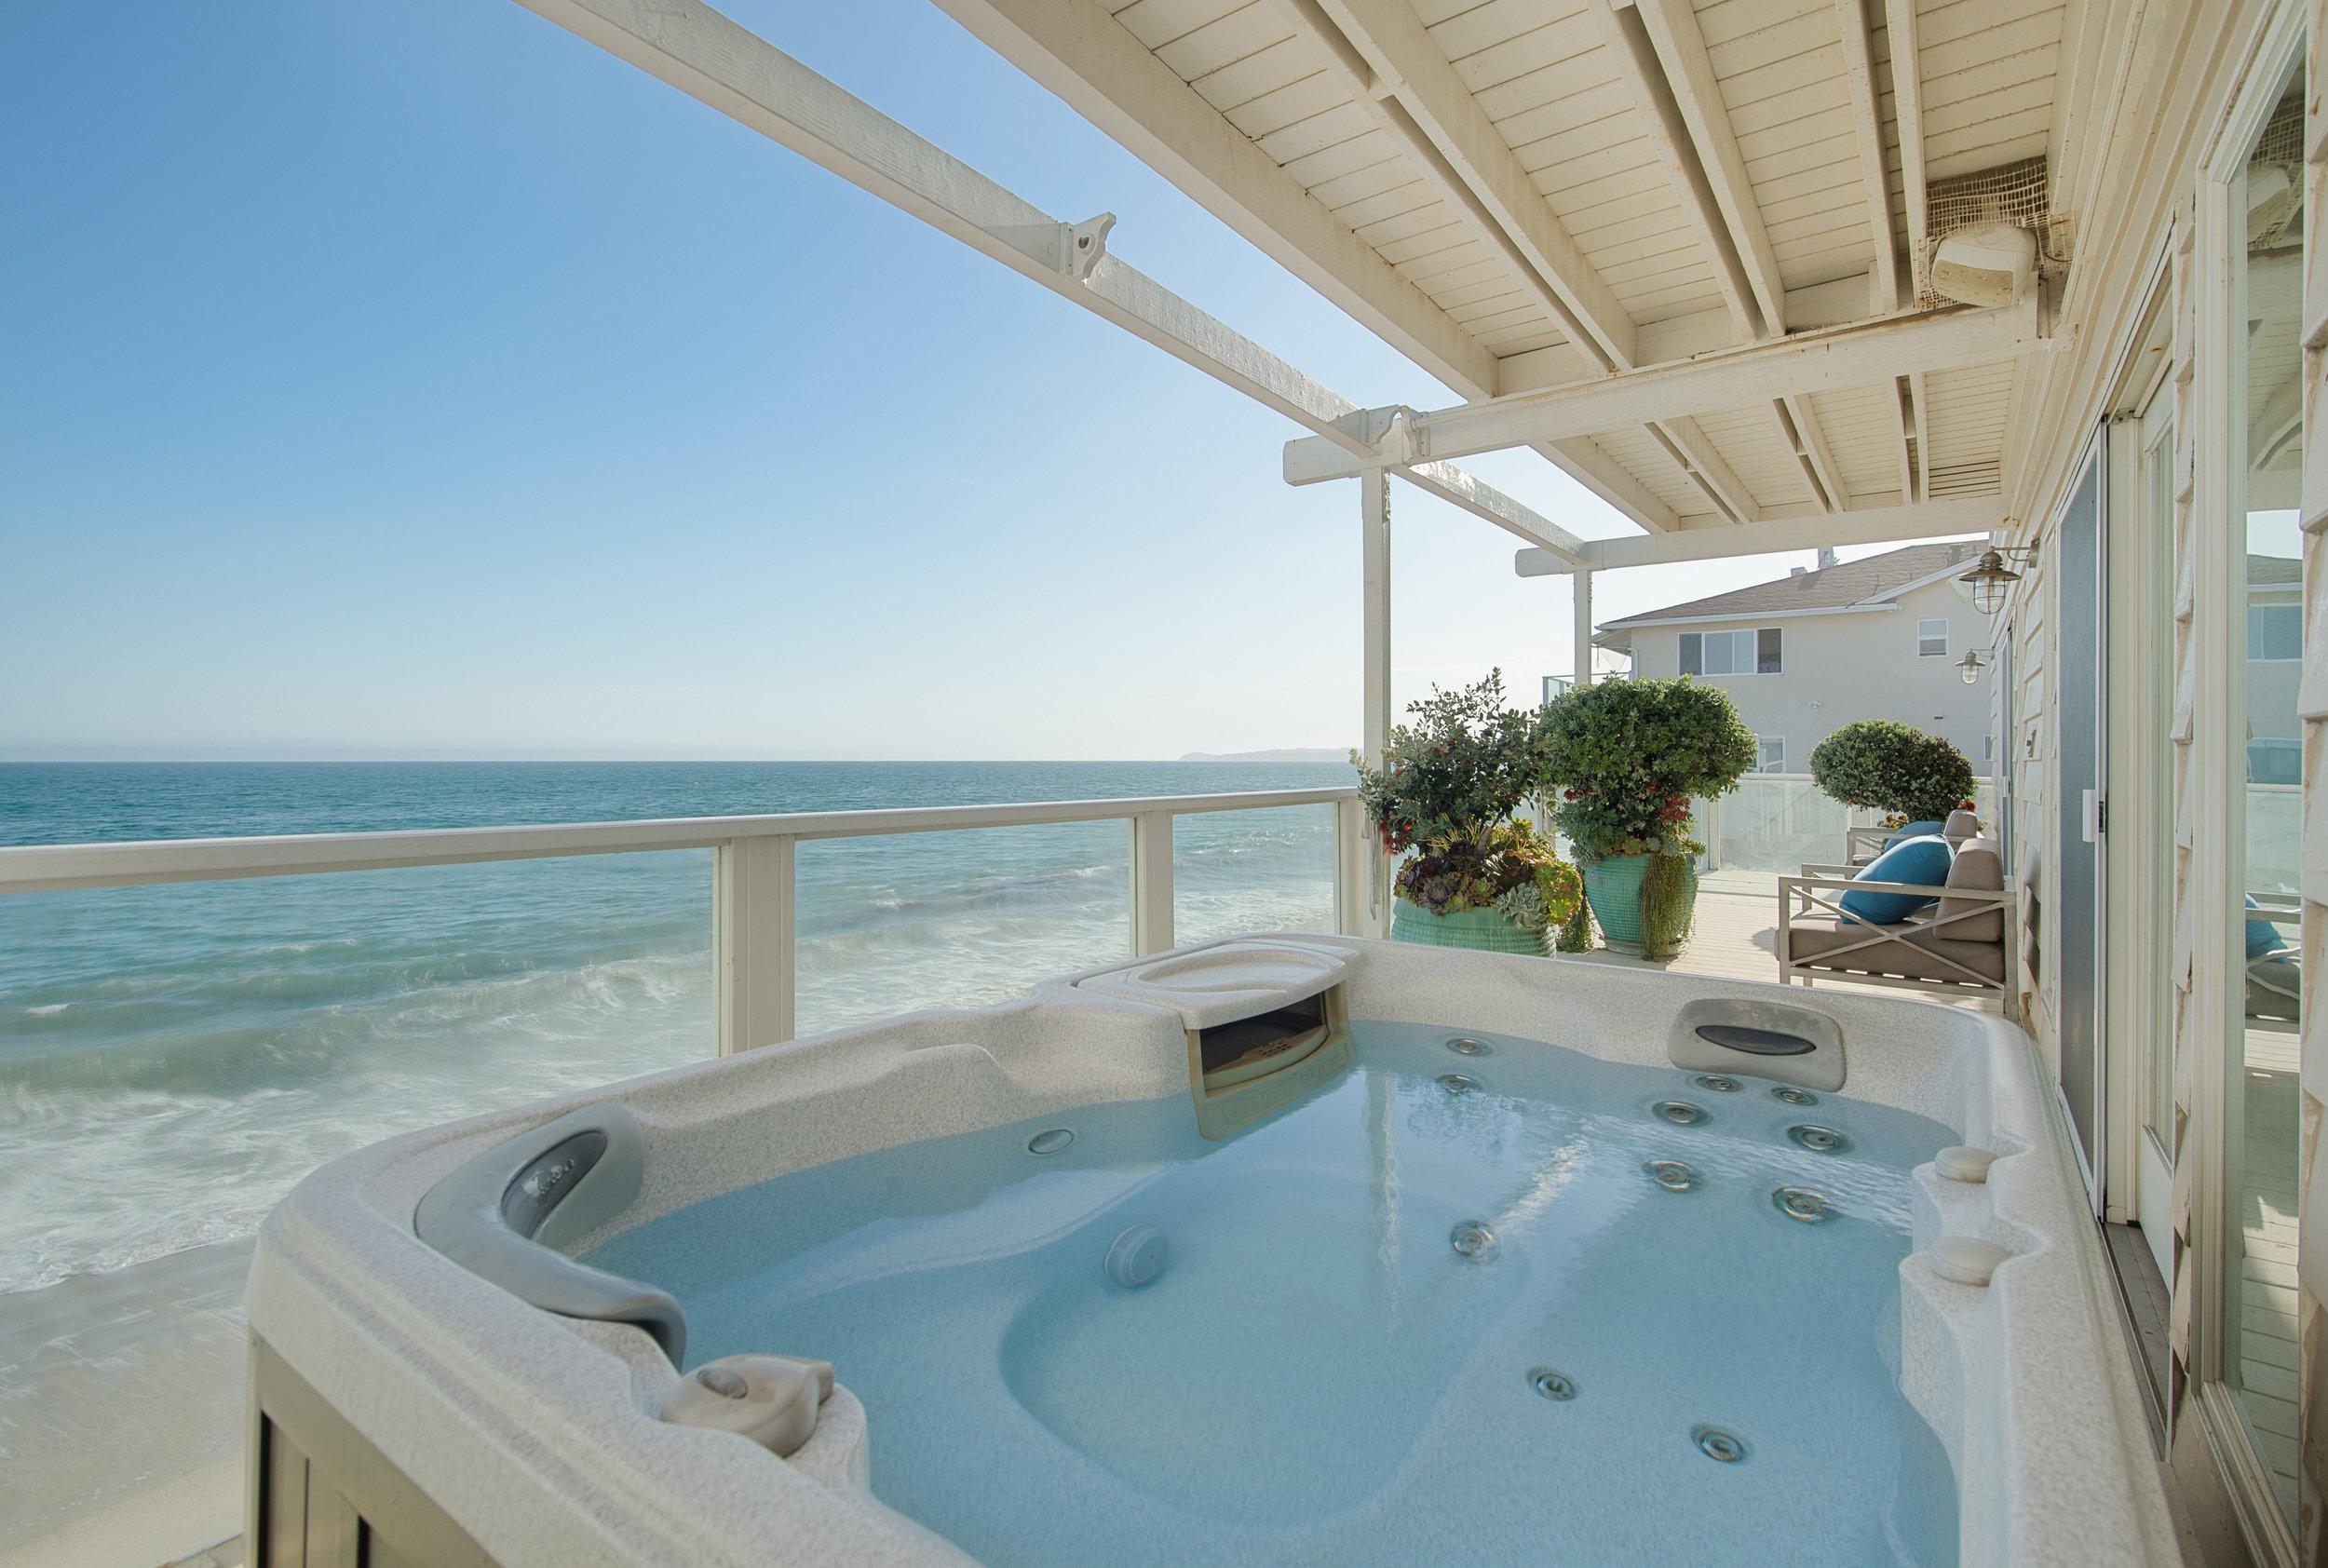 024 Deck 25342 Malibu Road For Sale Lease The Malibu Life Team Luxury Real Estate.jpg